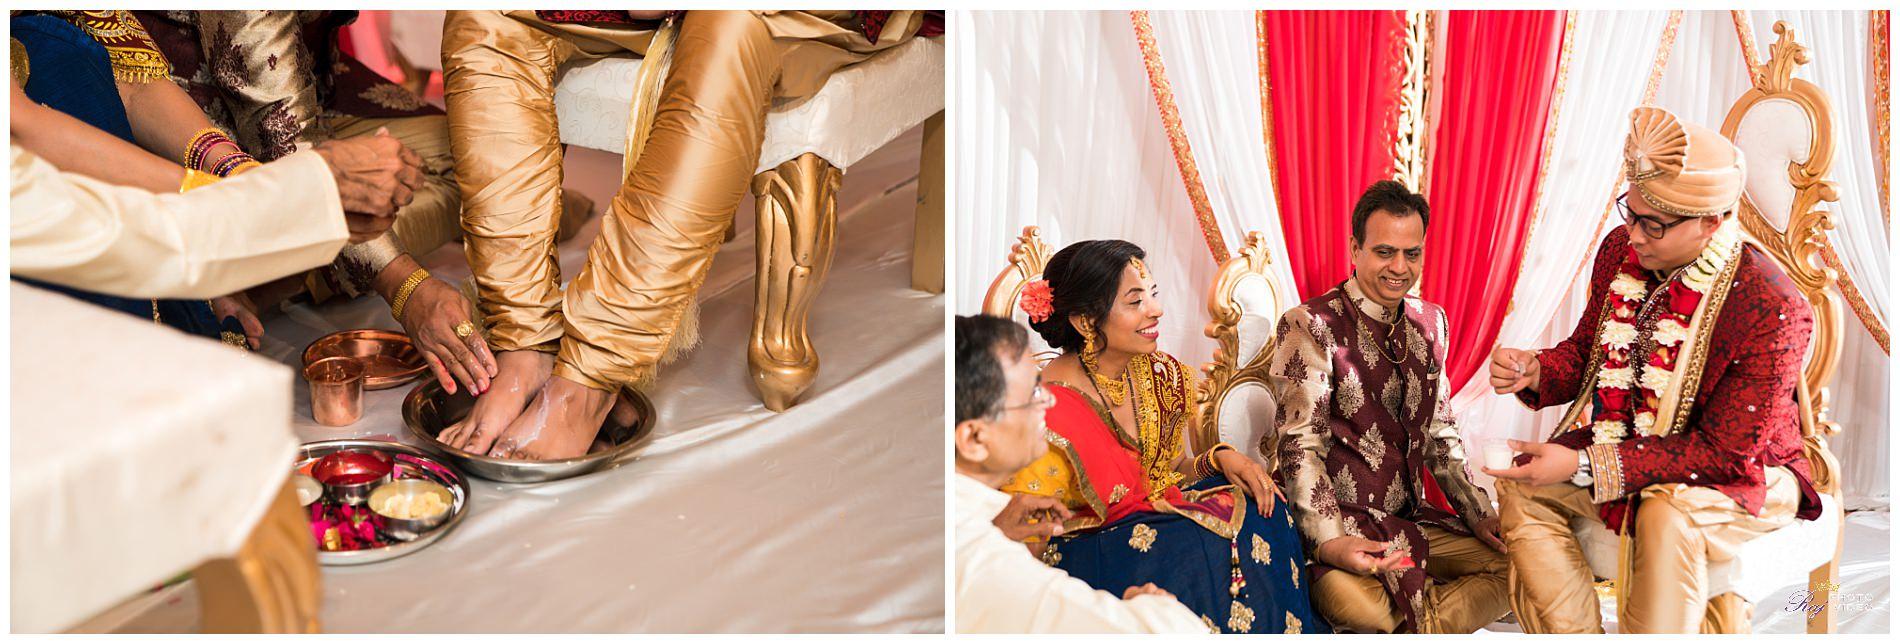 Aashirwad-Palace-Randolph-NJ-Hindu-Wedding-Ceremony-Khusbu-Jeff-7.jpg